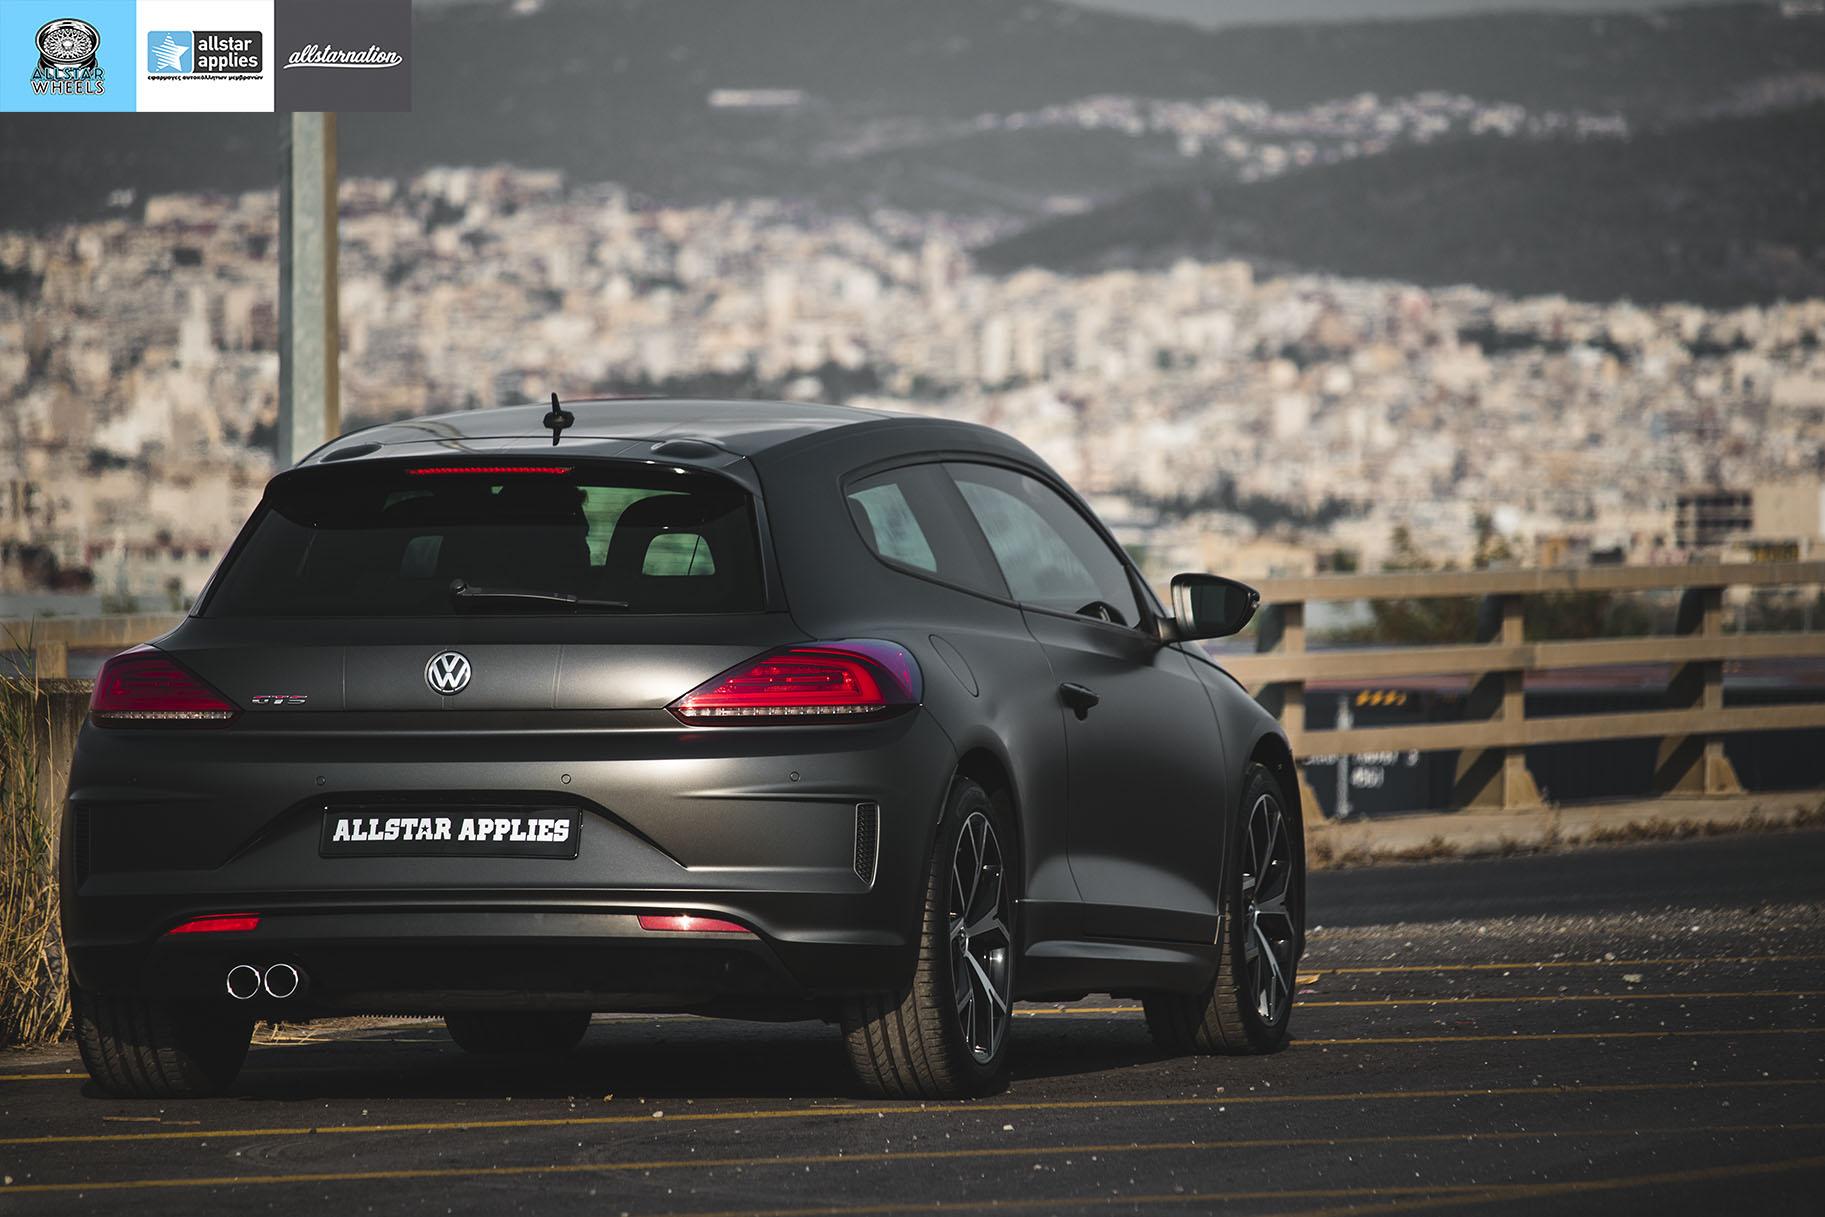 VW SCIROCCO MATT DIAMOND BLACK ALLSTAR APPLIES (21)